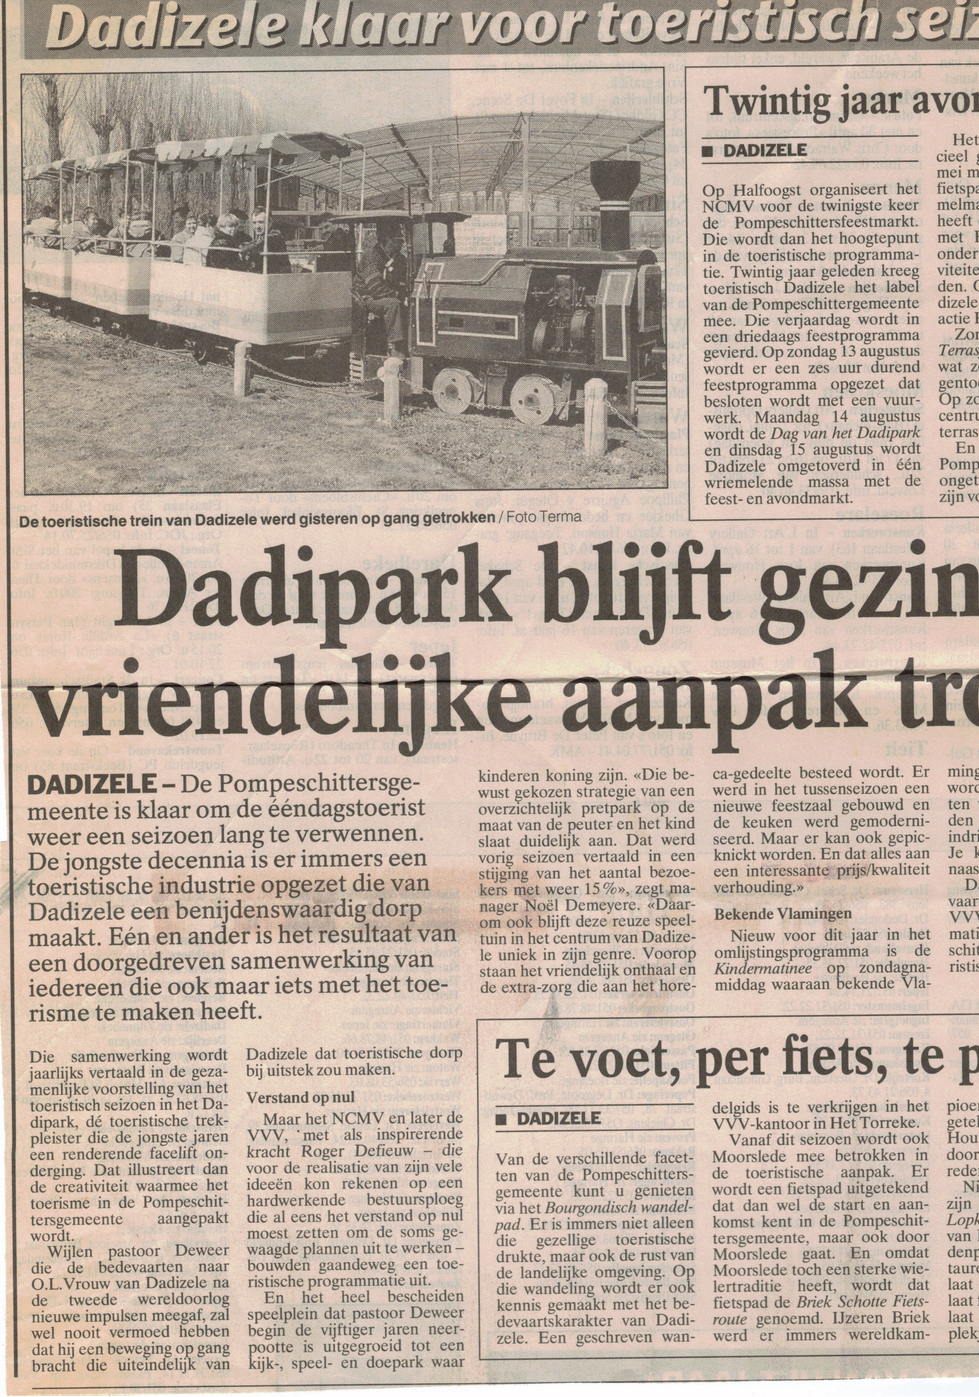 Dadipark krantenartikels_Pagina_10.png